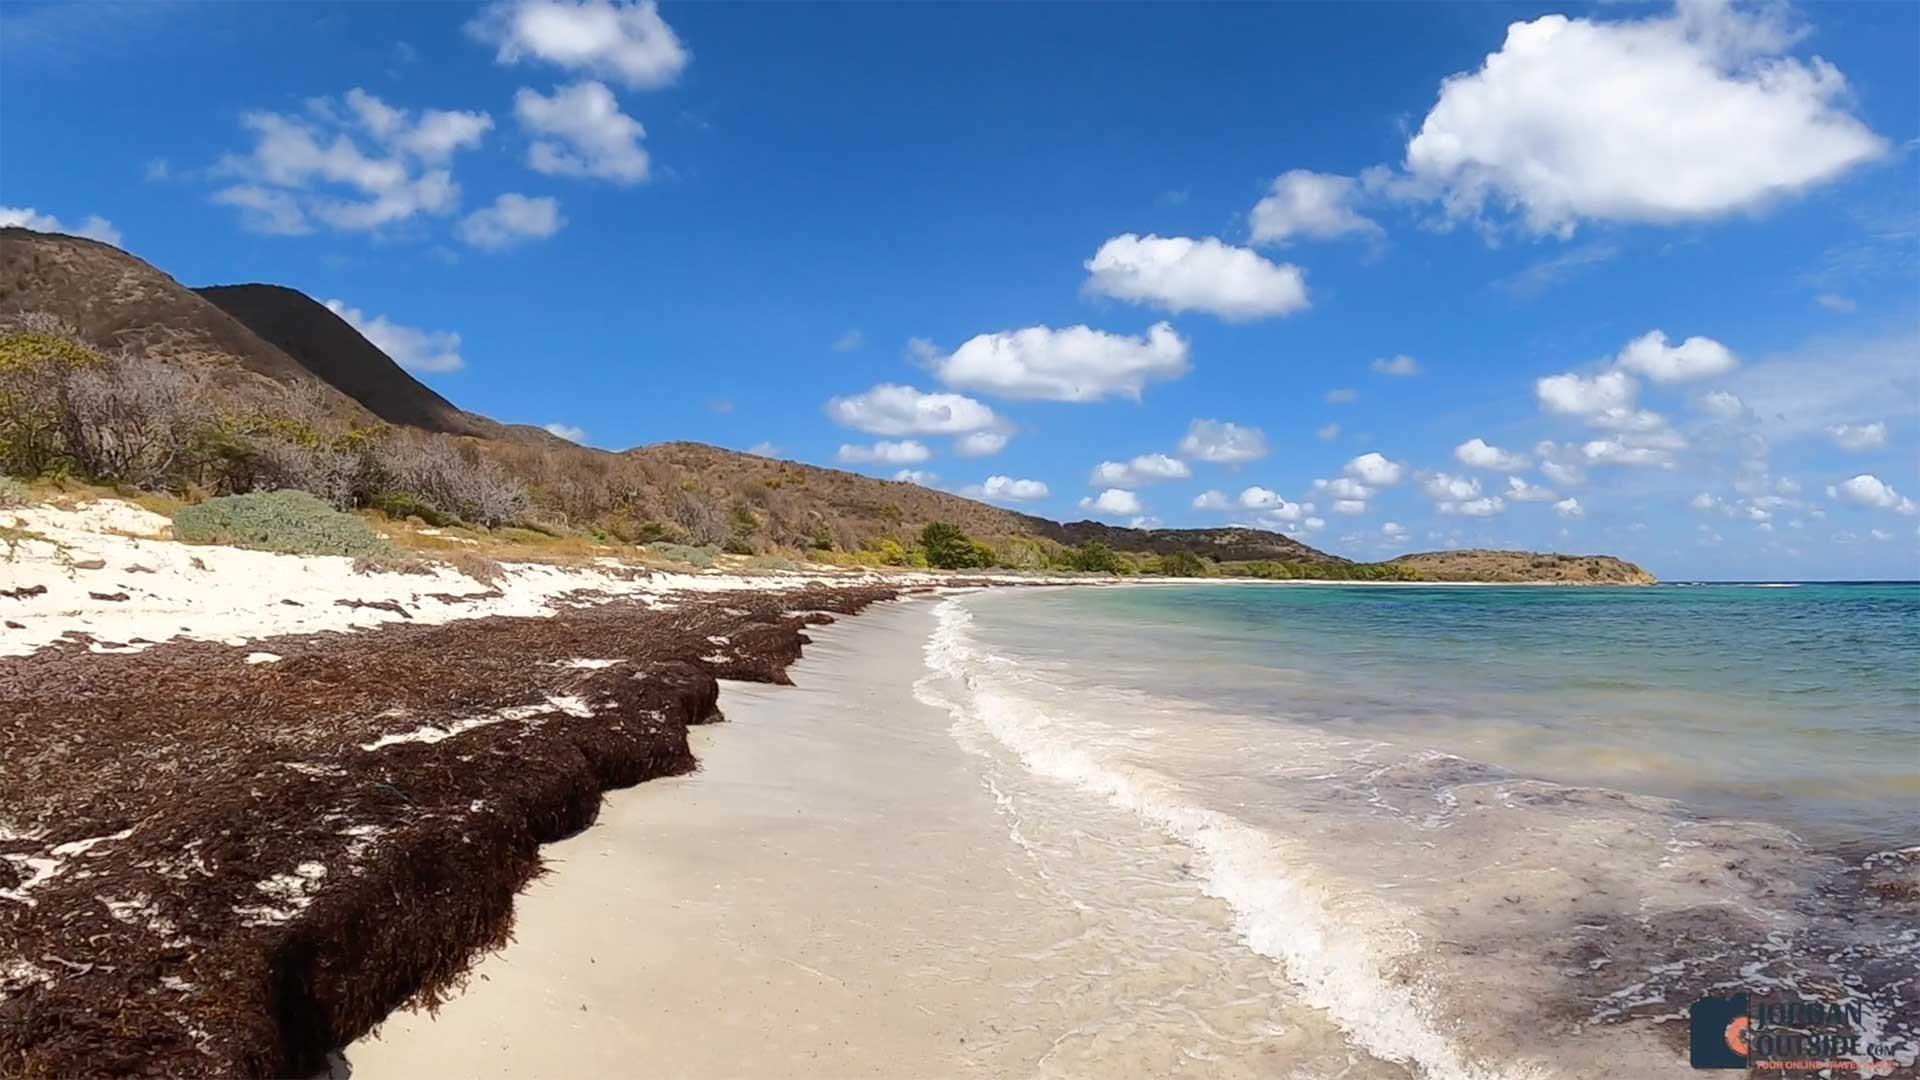 Seaweed at Jack's Bay Beach, St. Croix